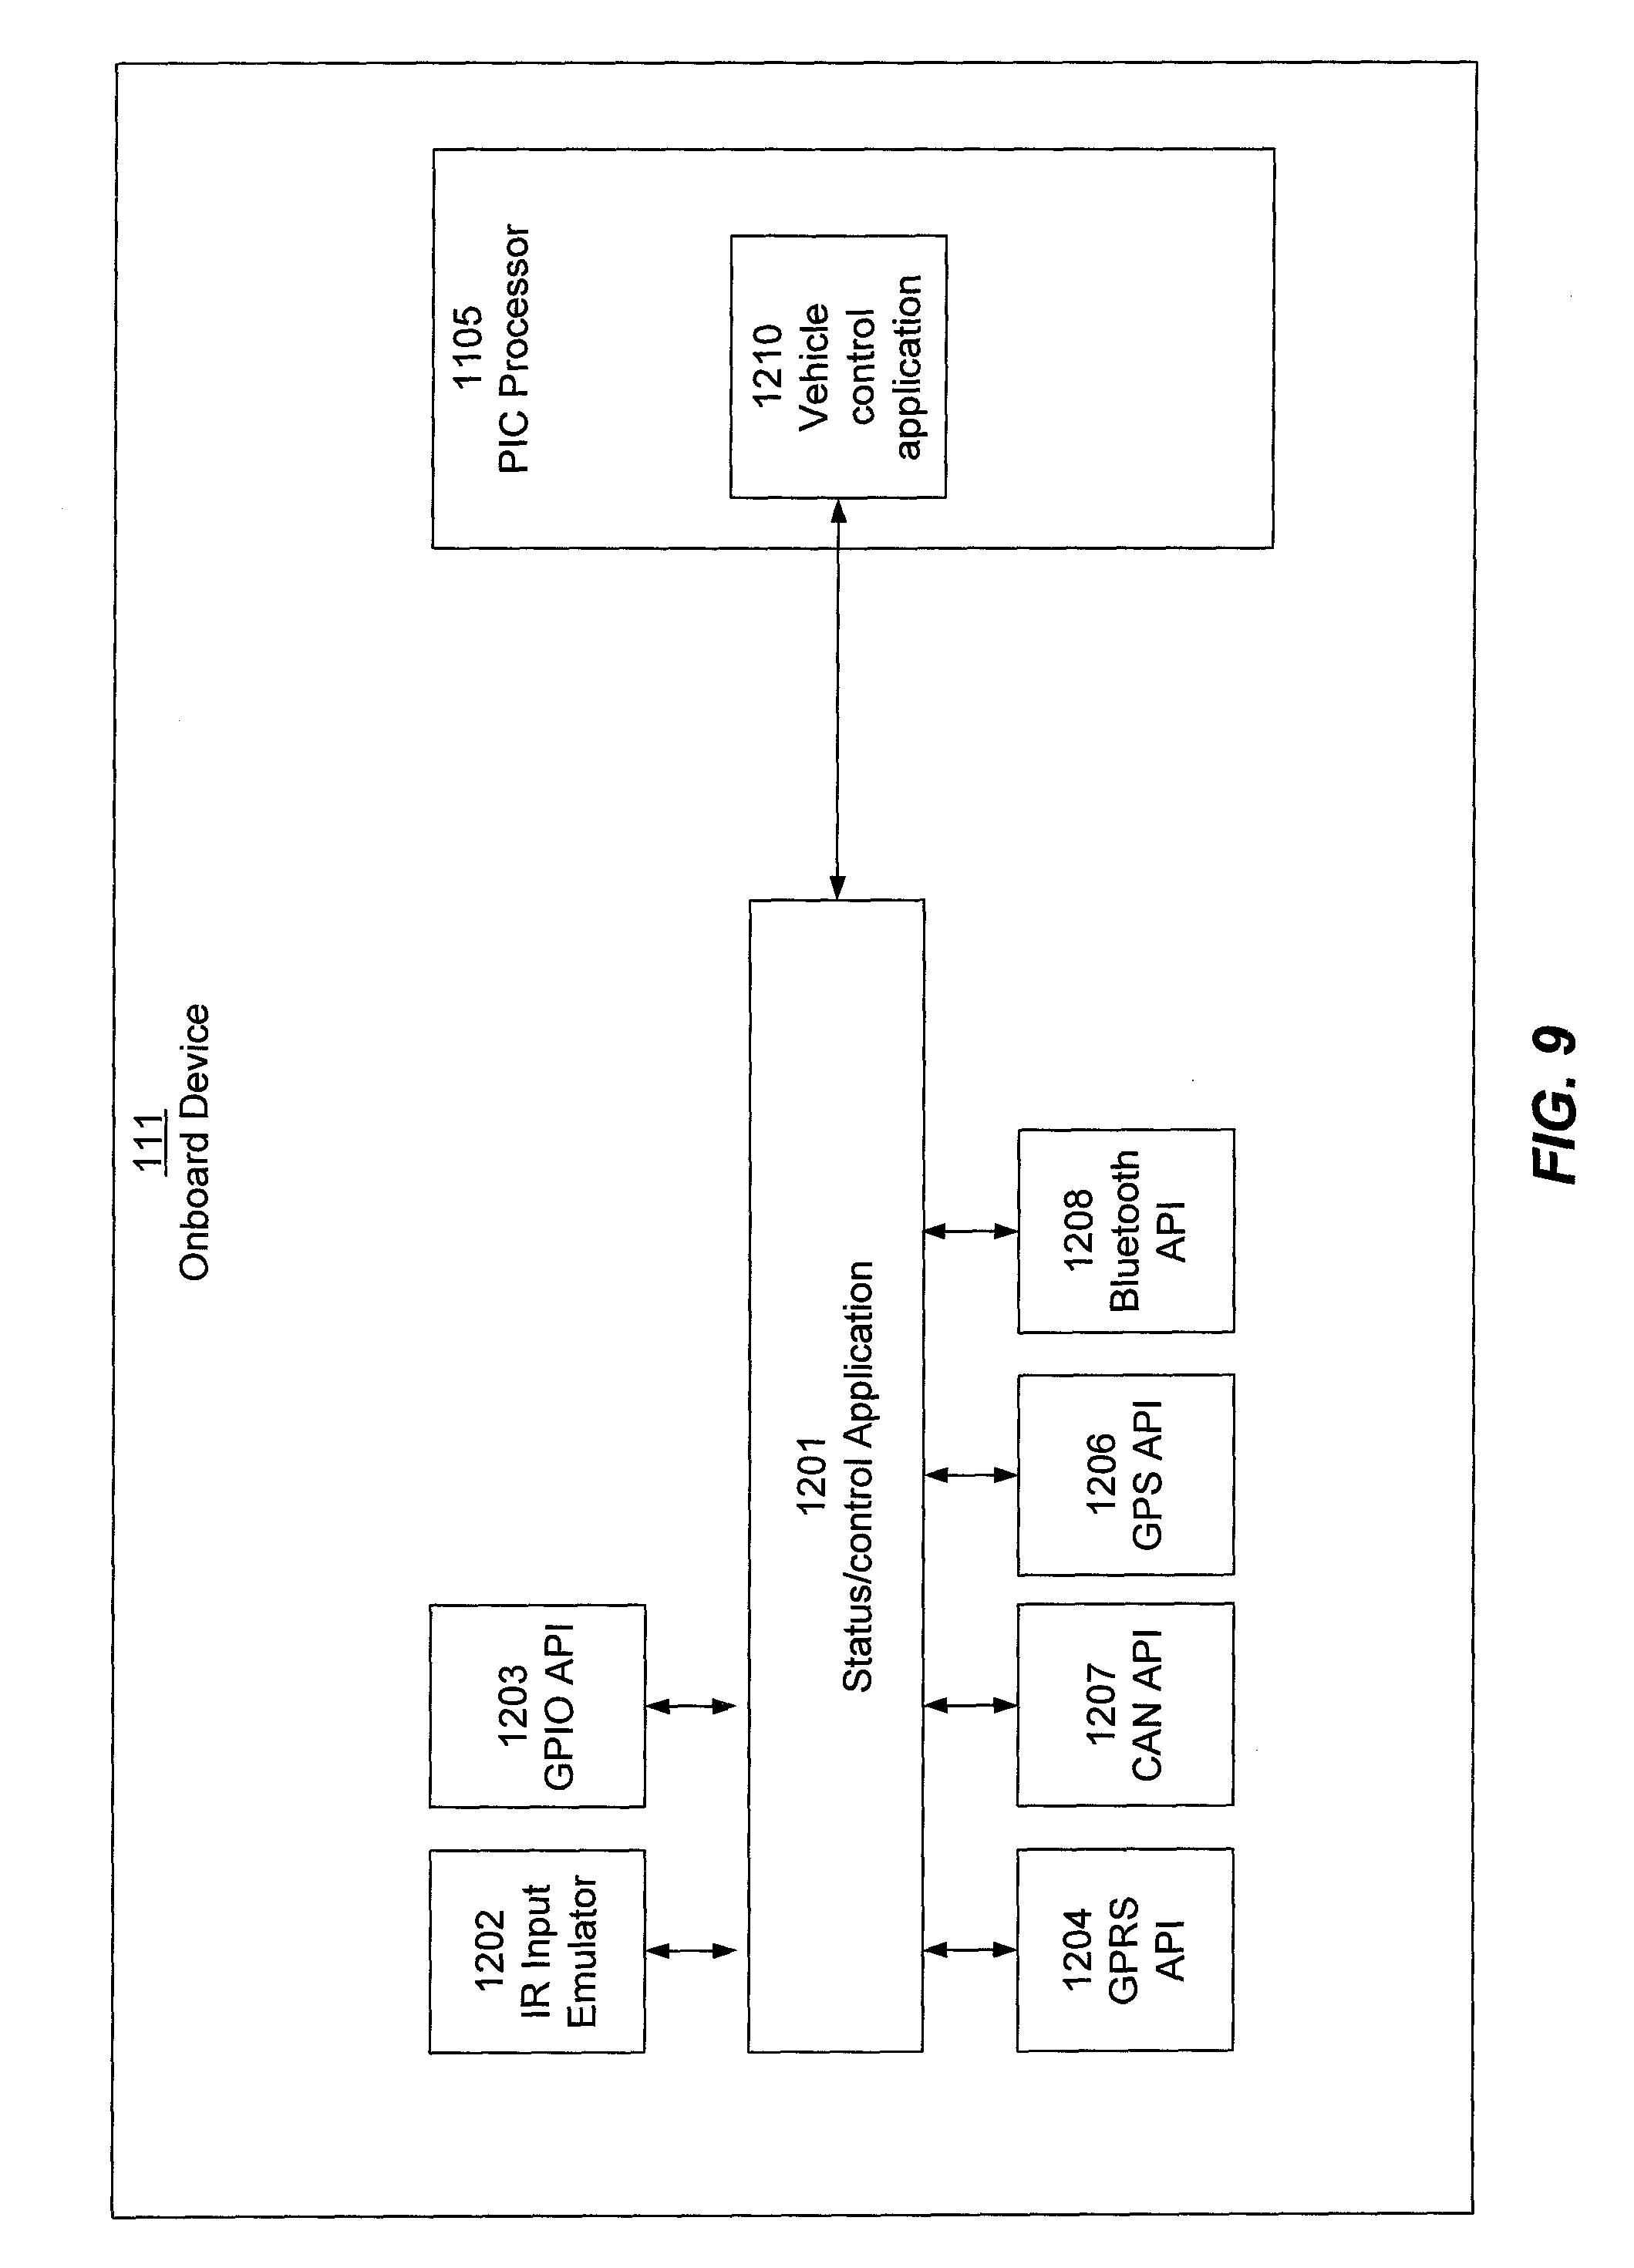 Passtime Pte 3 Wiring Diagram | Manual E-Books - Passtime Gps Wiring Diagram